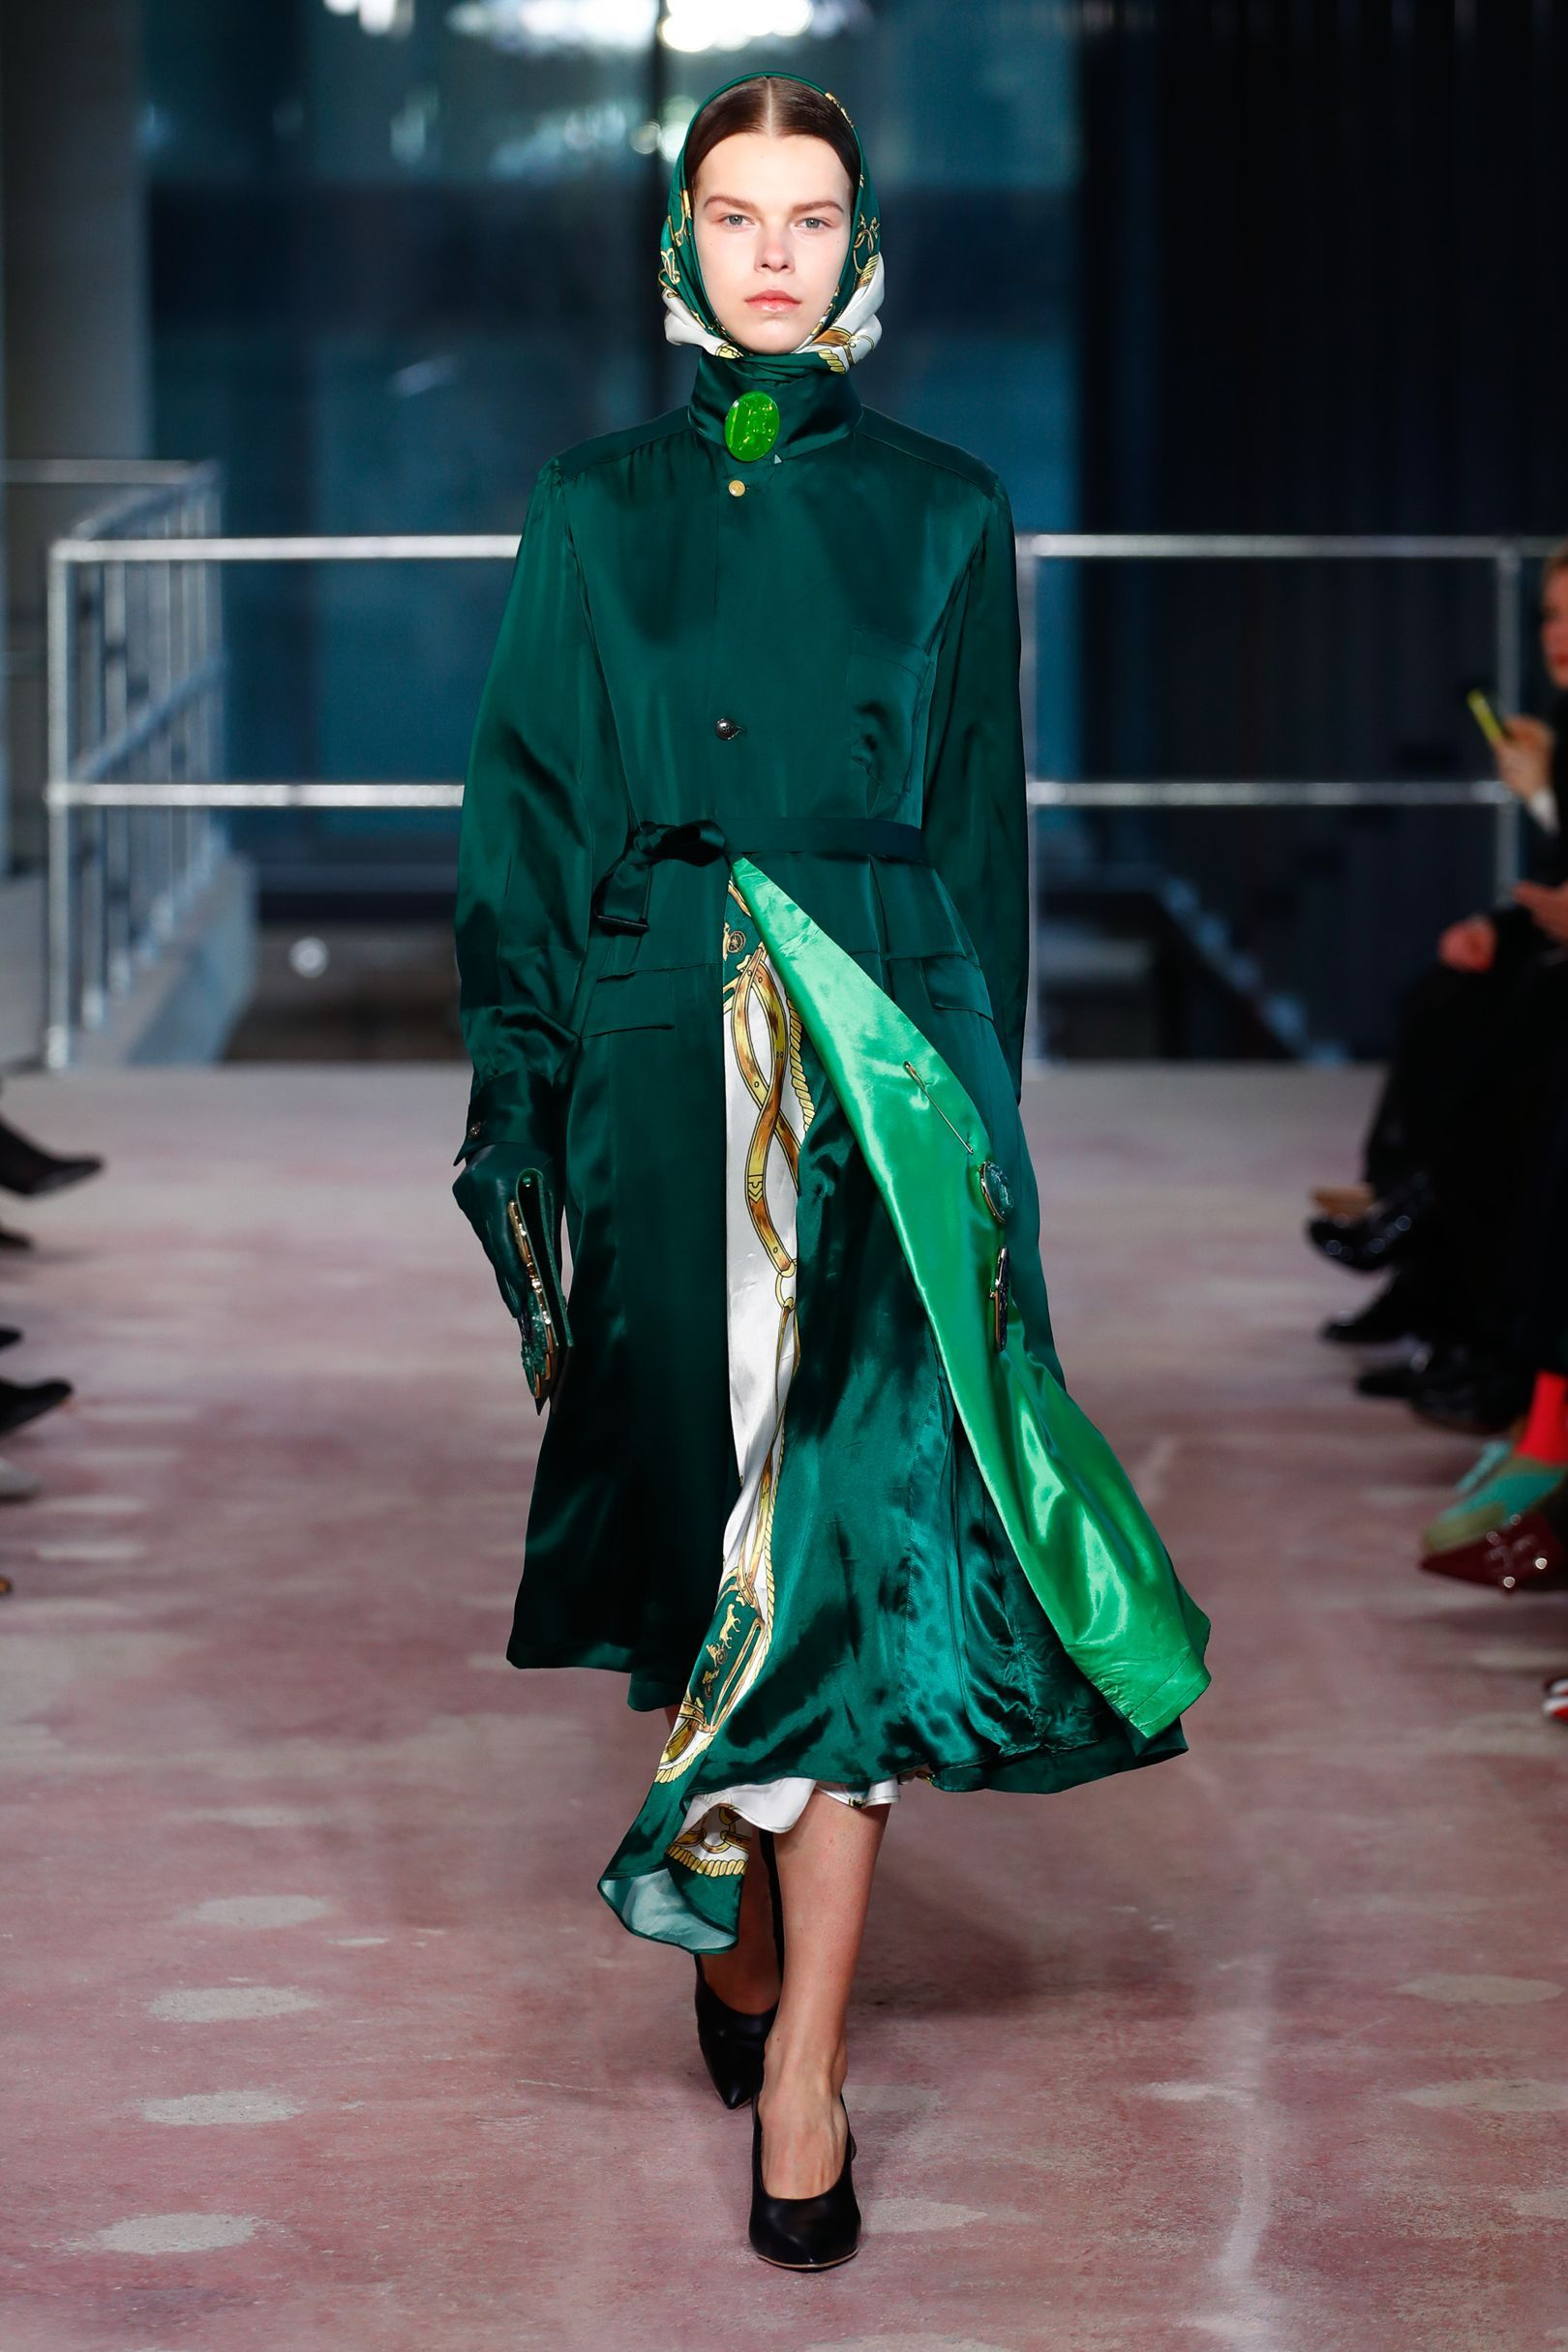 AW18 Trend: Scarf Prints | AW18 | Fashion, Fashion 2018 ...